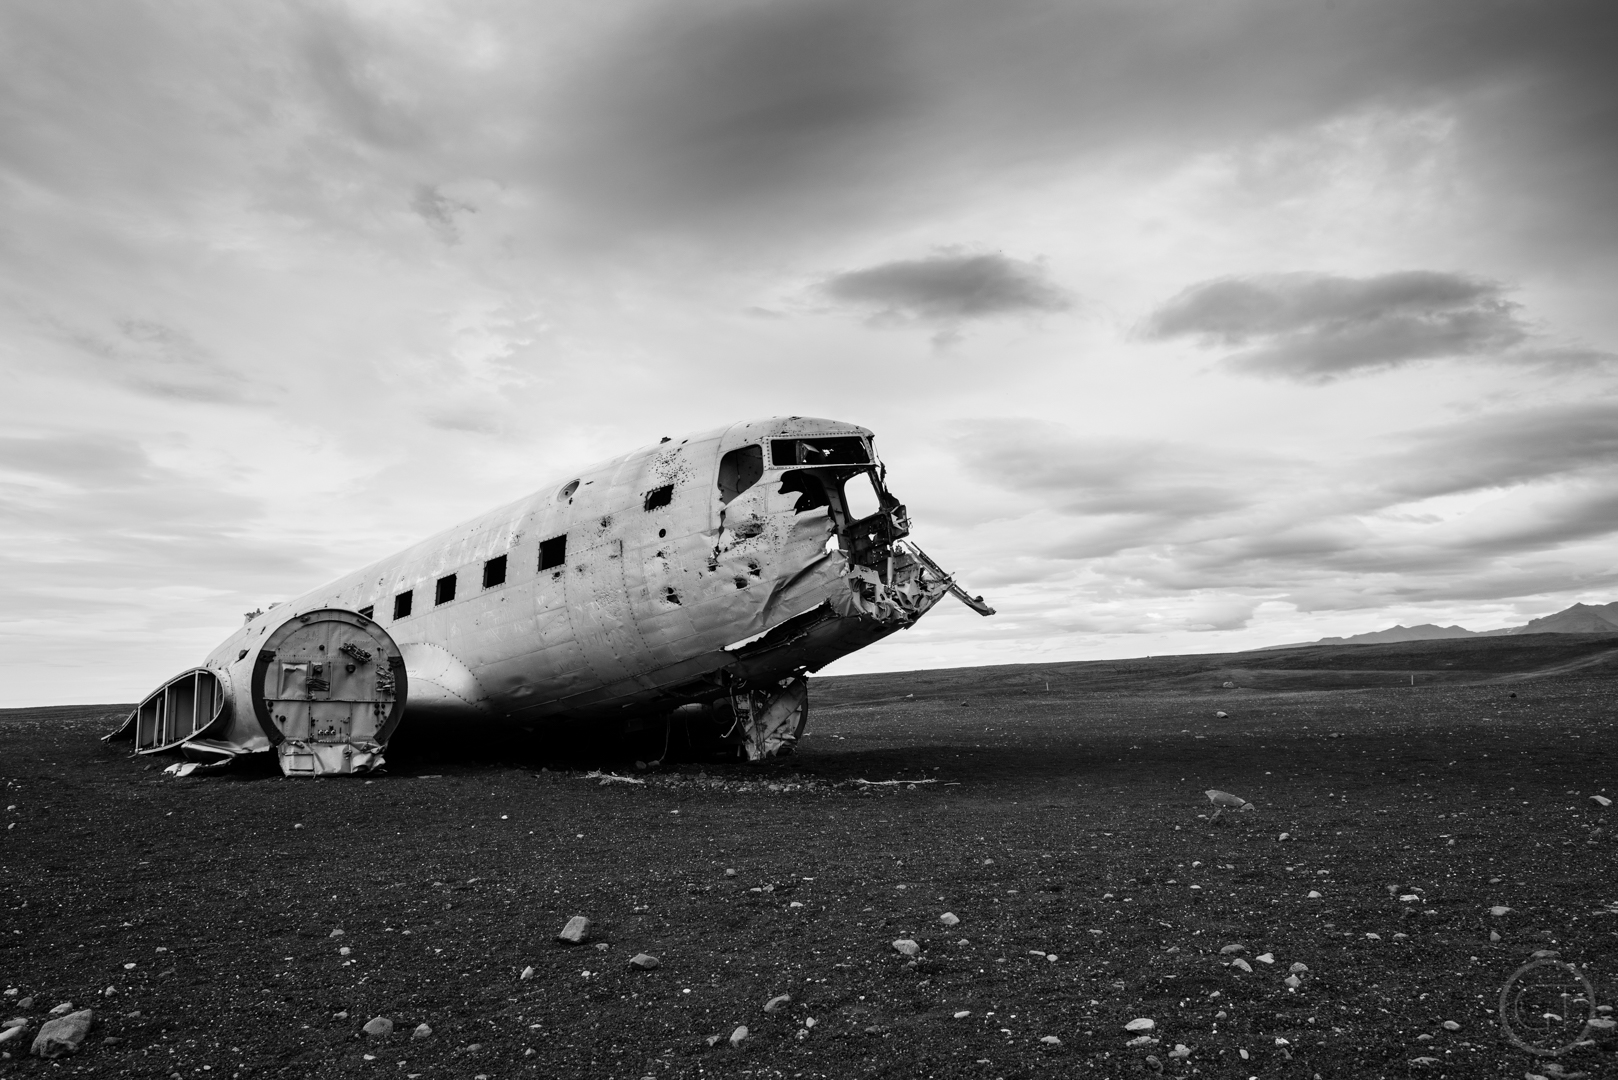 Iceland-gustav-thuesen-photography-landscape-nature-københavn-danmark-adventure-outdoor-lifestyle-30.jpg